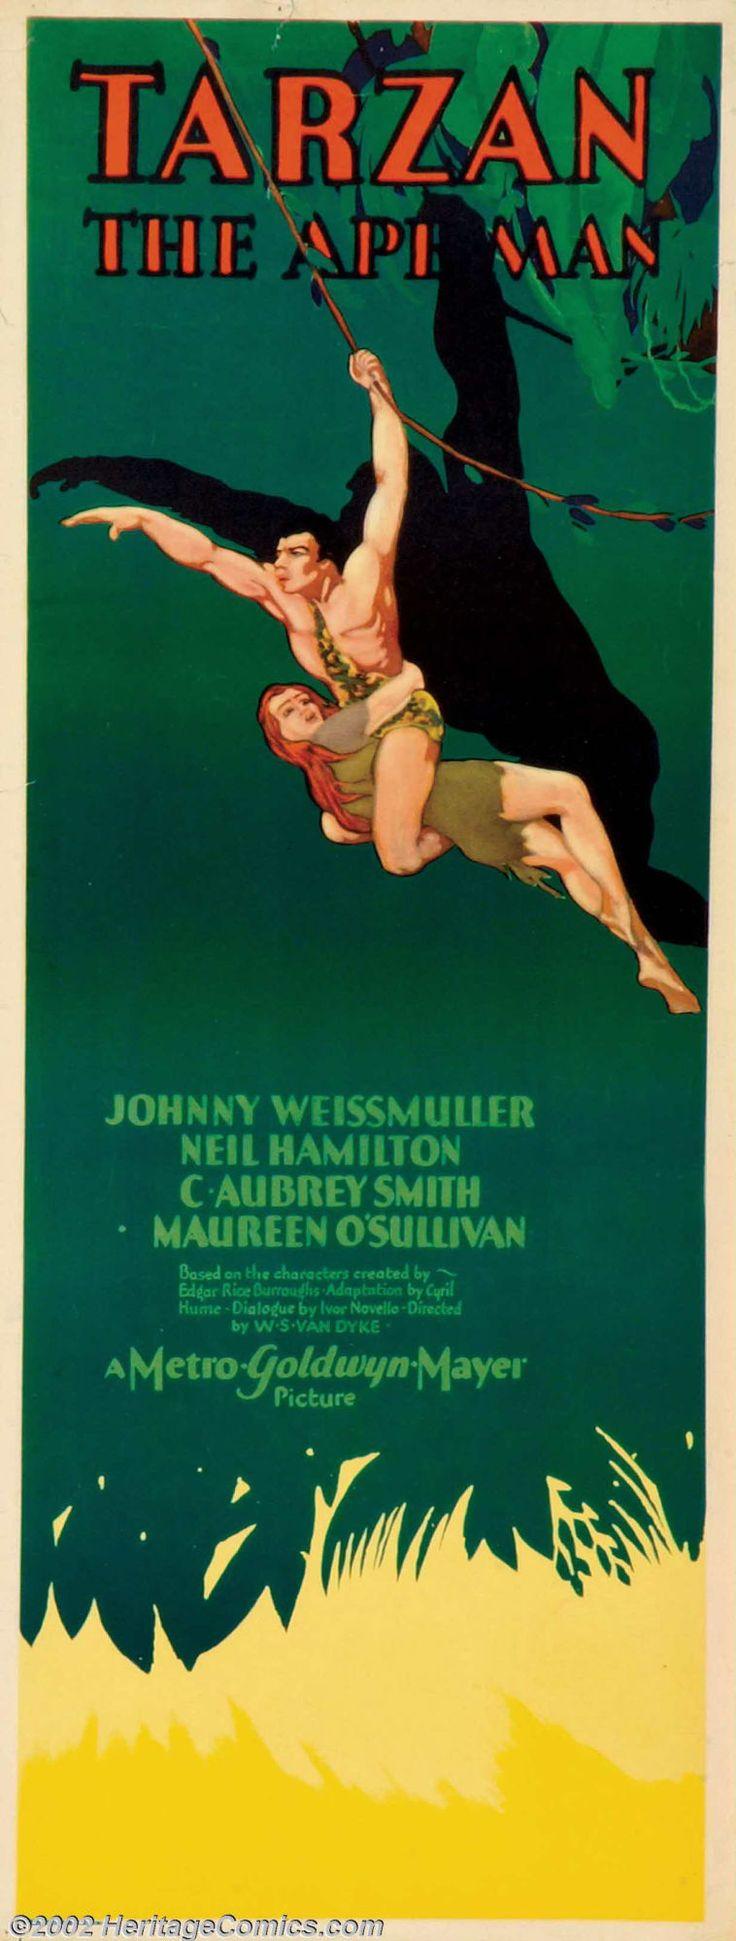 Tarzan Hollywood Classics 1 Movie free download HD 720p